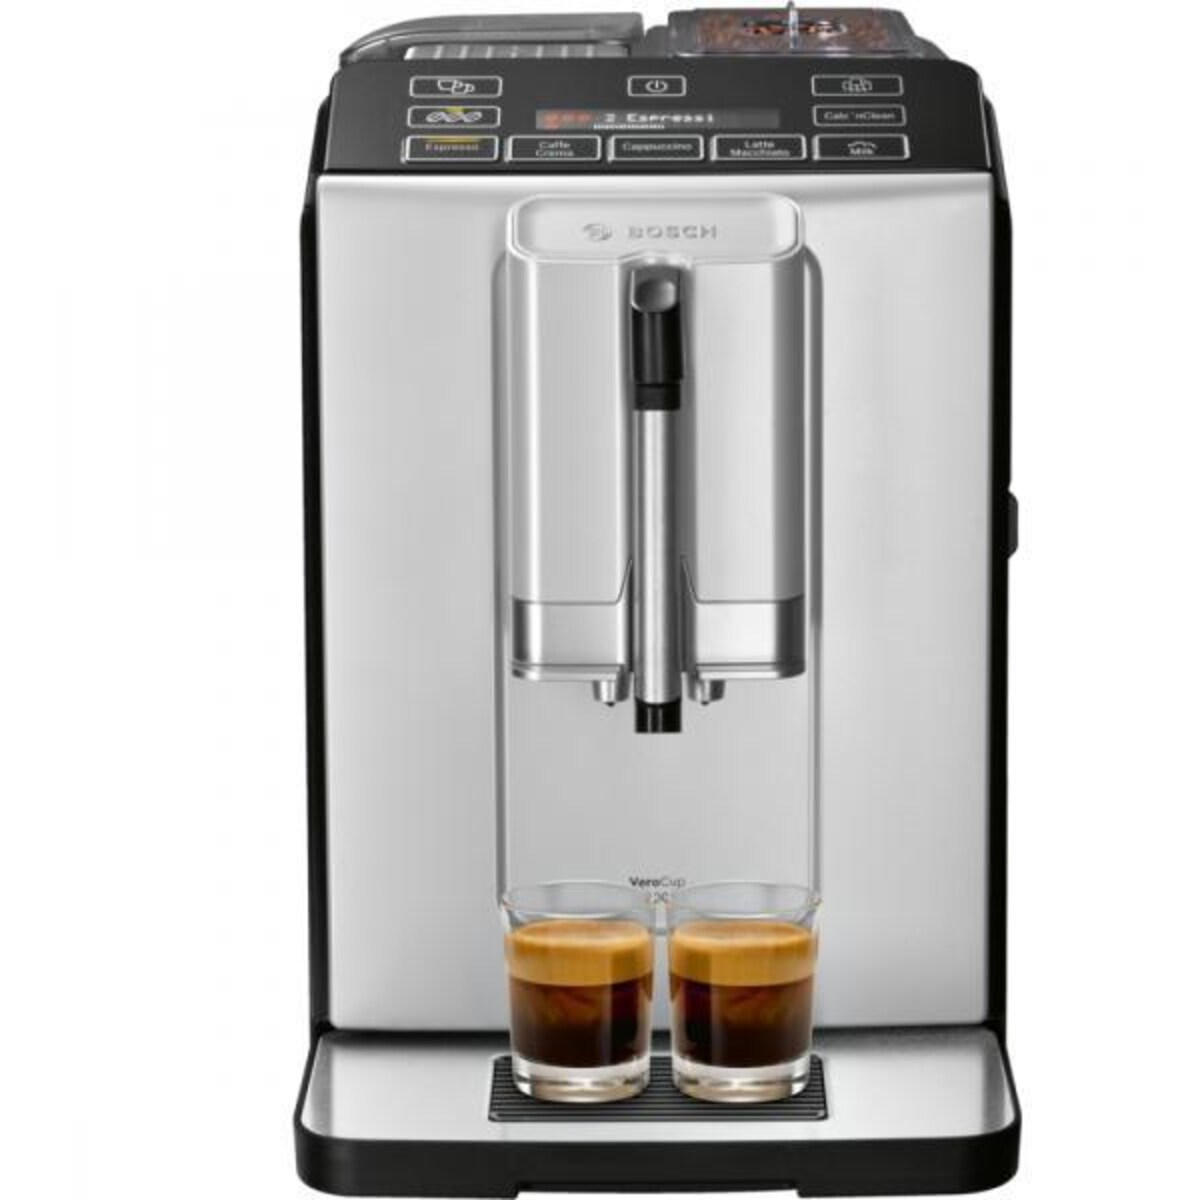 Bosch Кафеавтомат VeroCup 300 Сребристо TIS30321RW 00406686